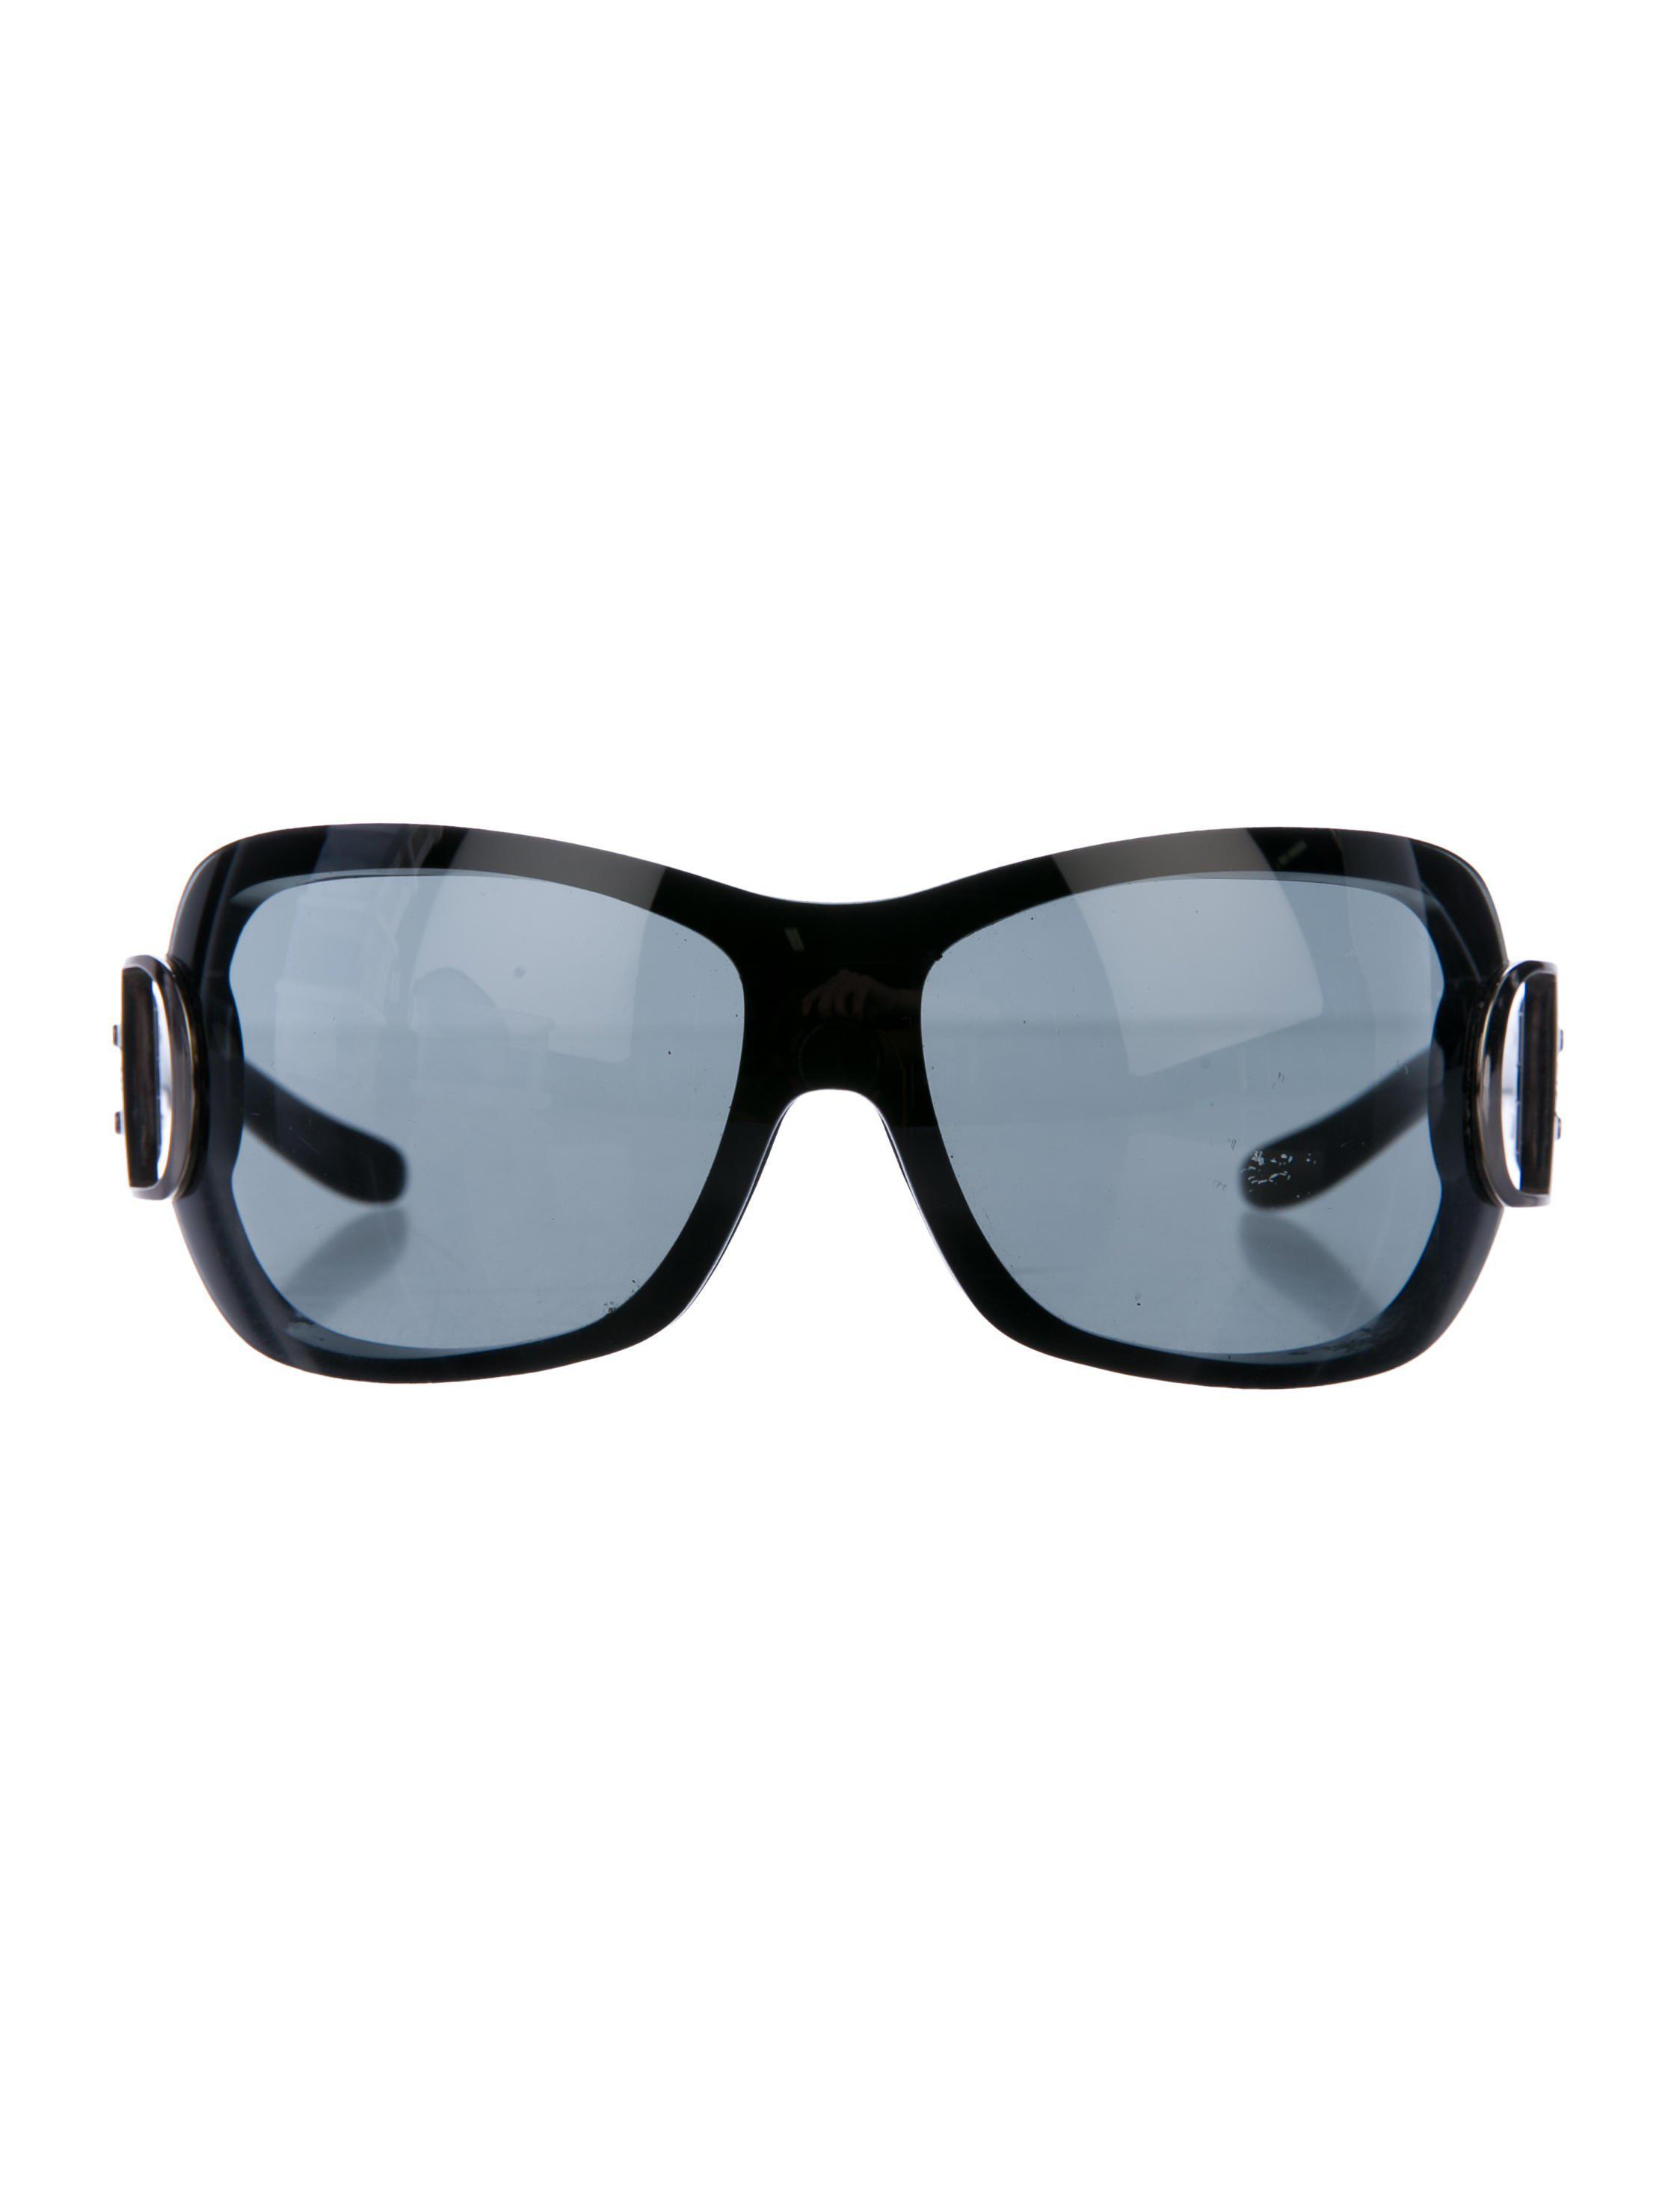 06017267e9d9e Lyst - Dior Airspeed 2 Shield Sunglasses in Black